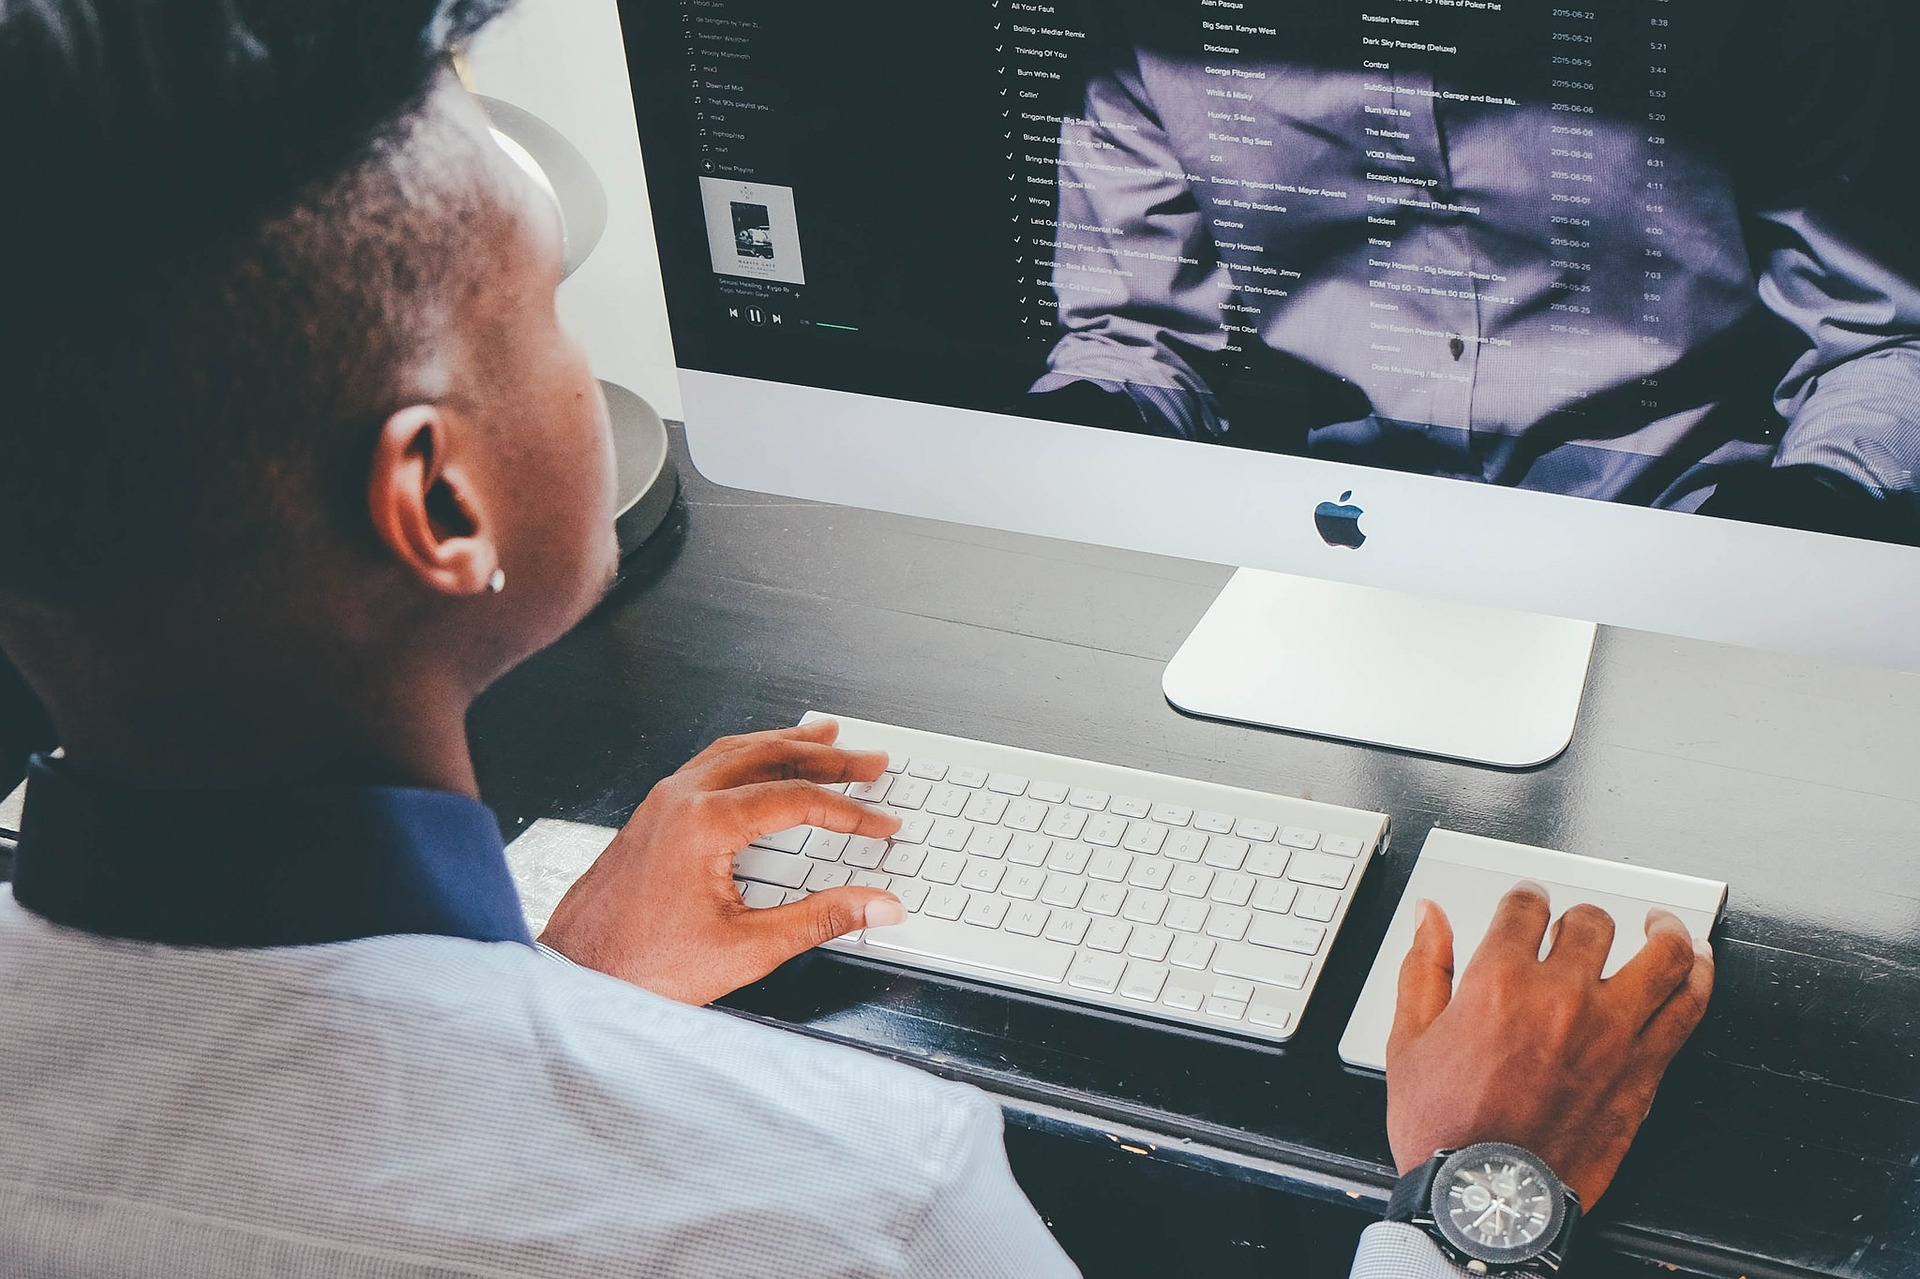 Man Browsing Assets Using ValidiFI's Account Validation Solutions